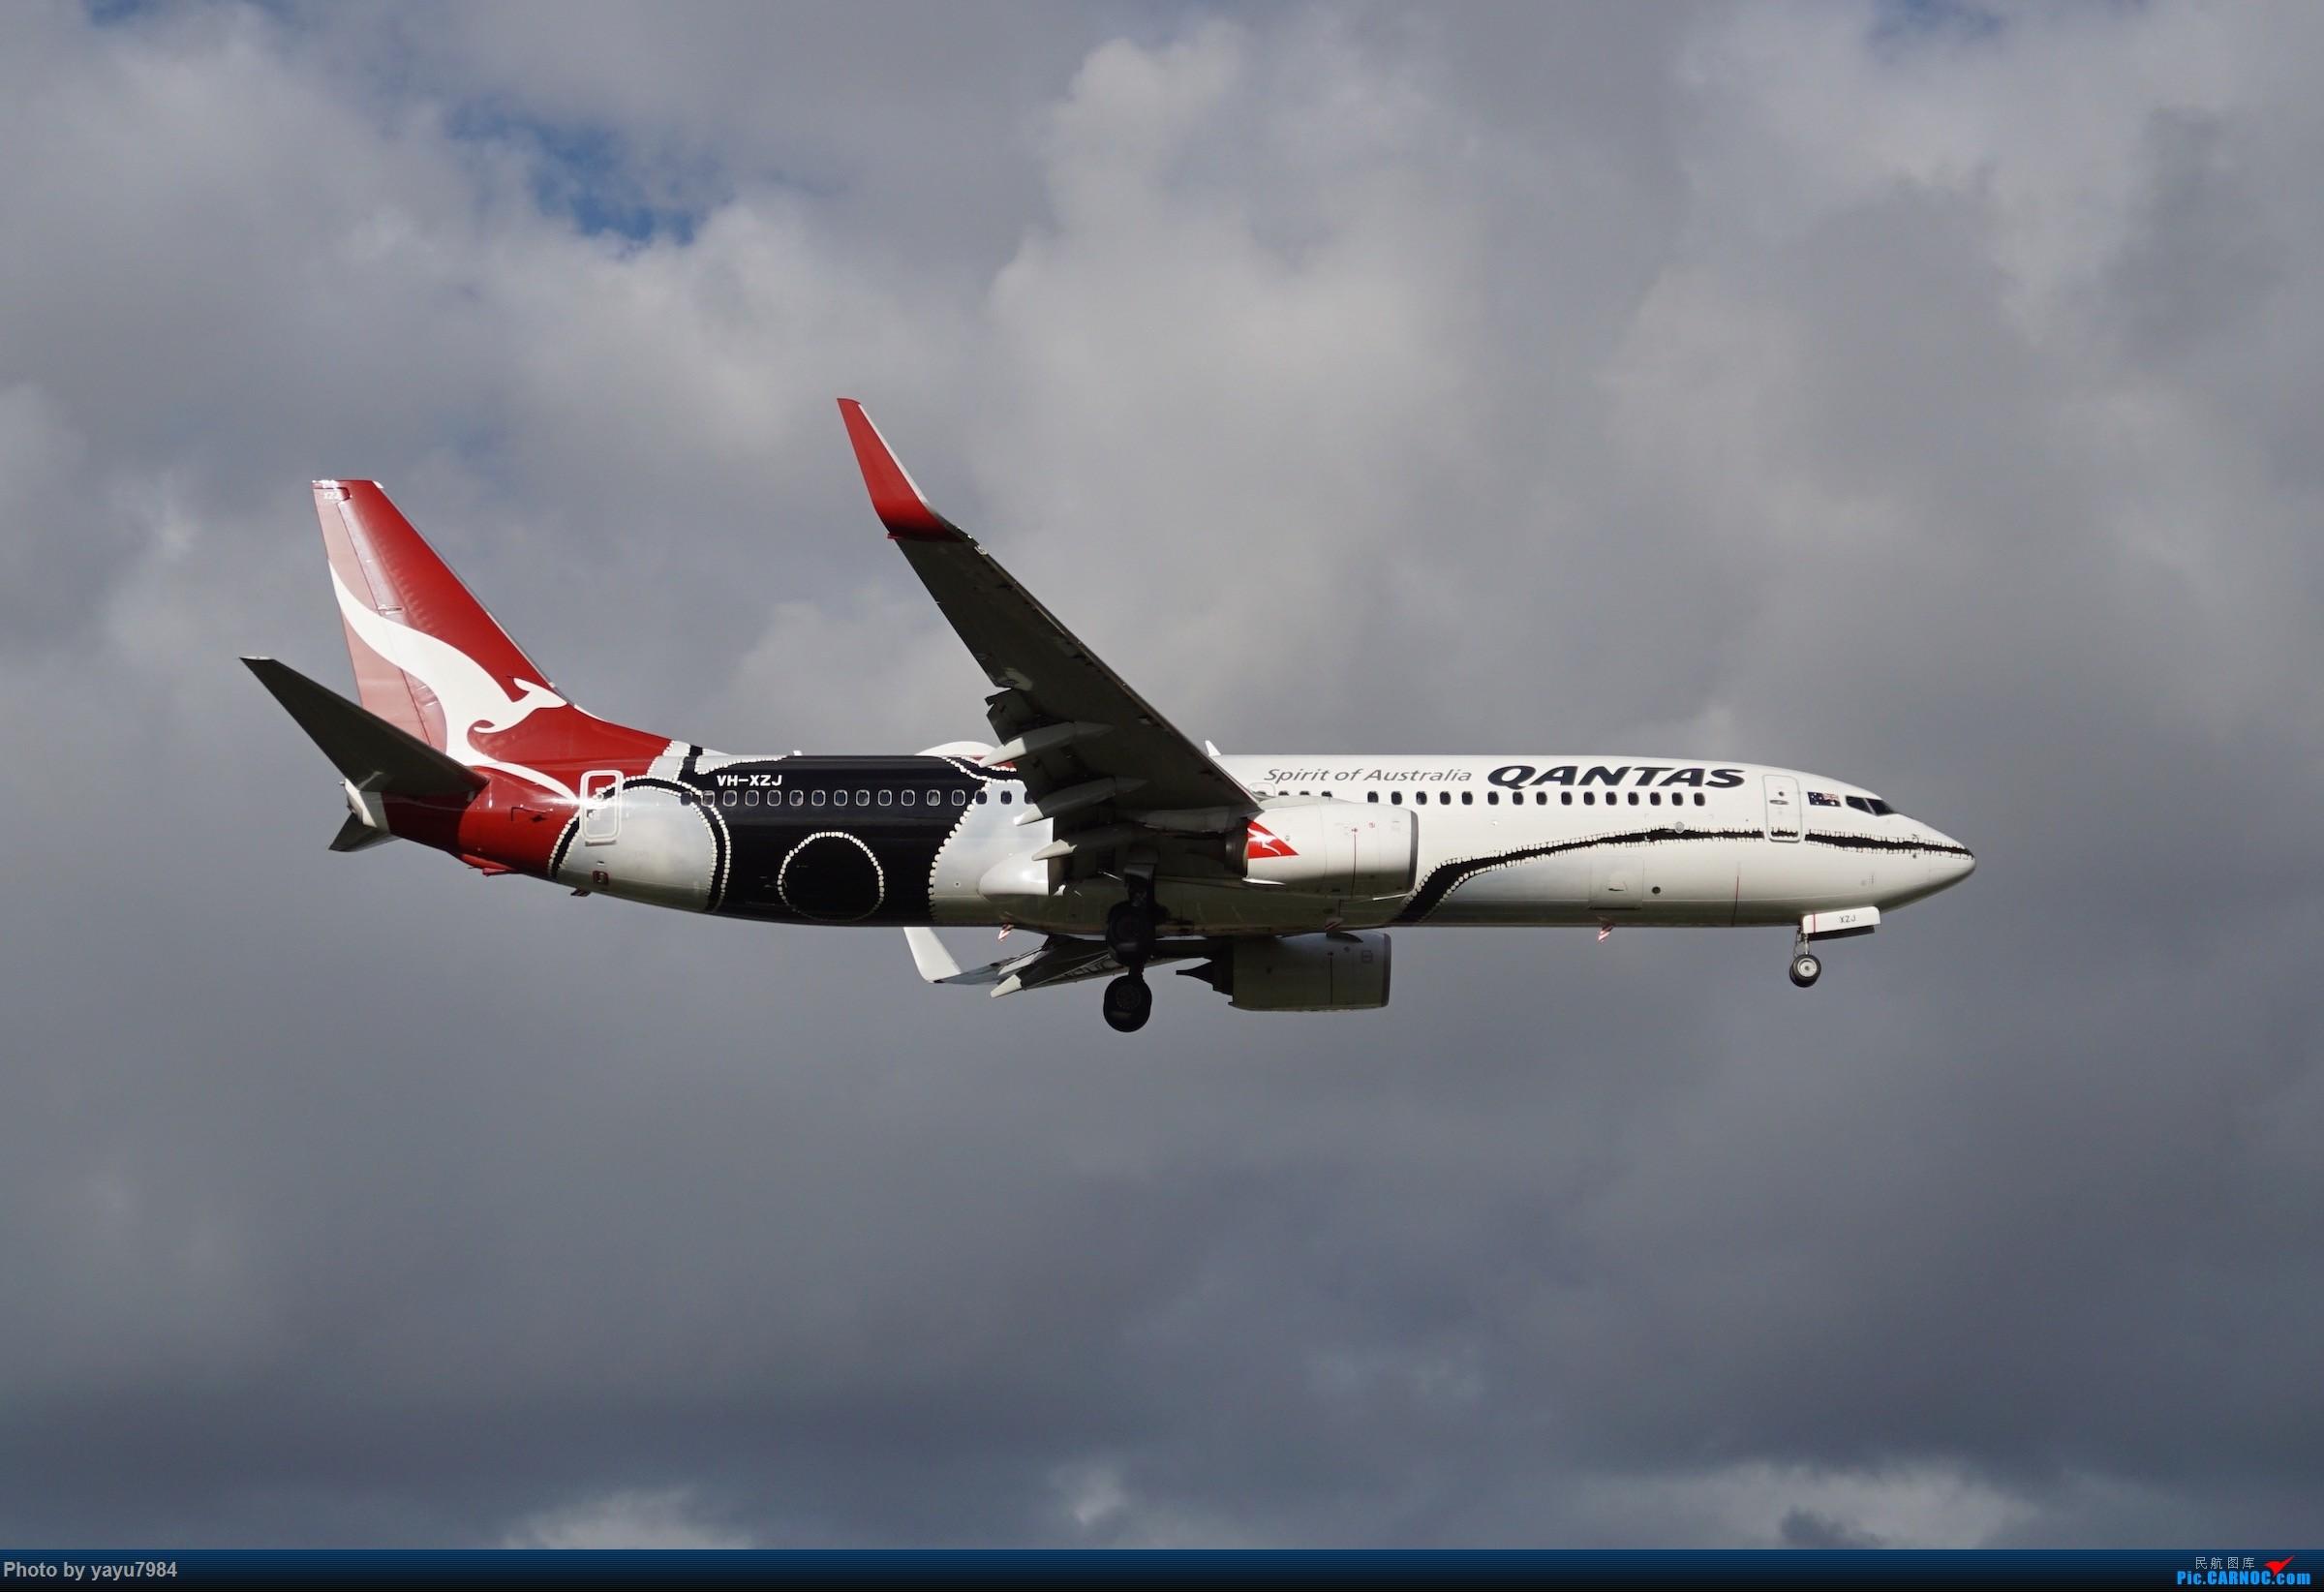 Re:[原创][SYD] 烂天解锁A340-300,顺带其他好货 BOEING 737-800 VH-XZJ 澳大利亚悉尼金斯福德·史密斯机场